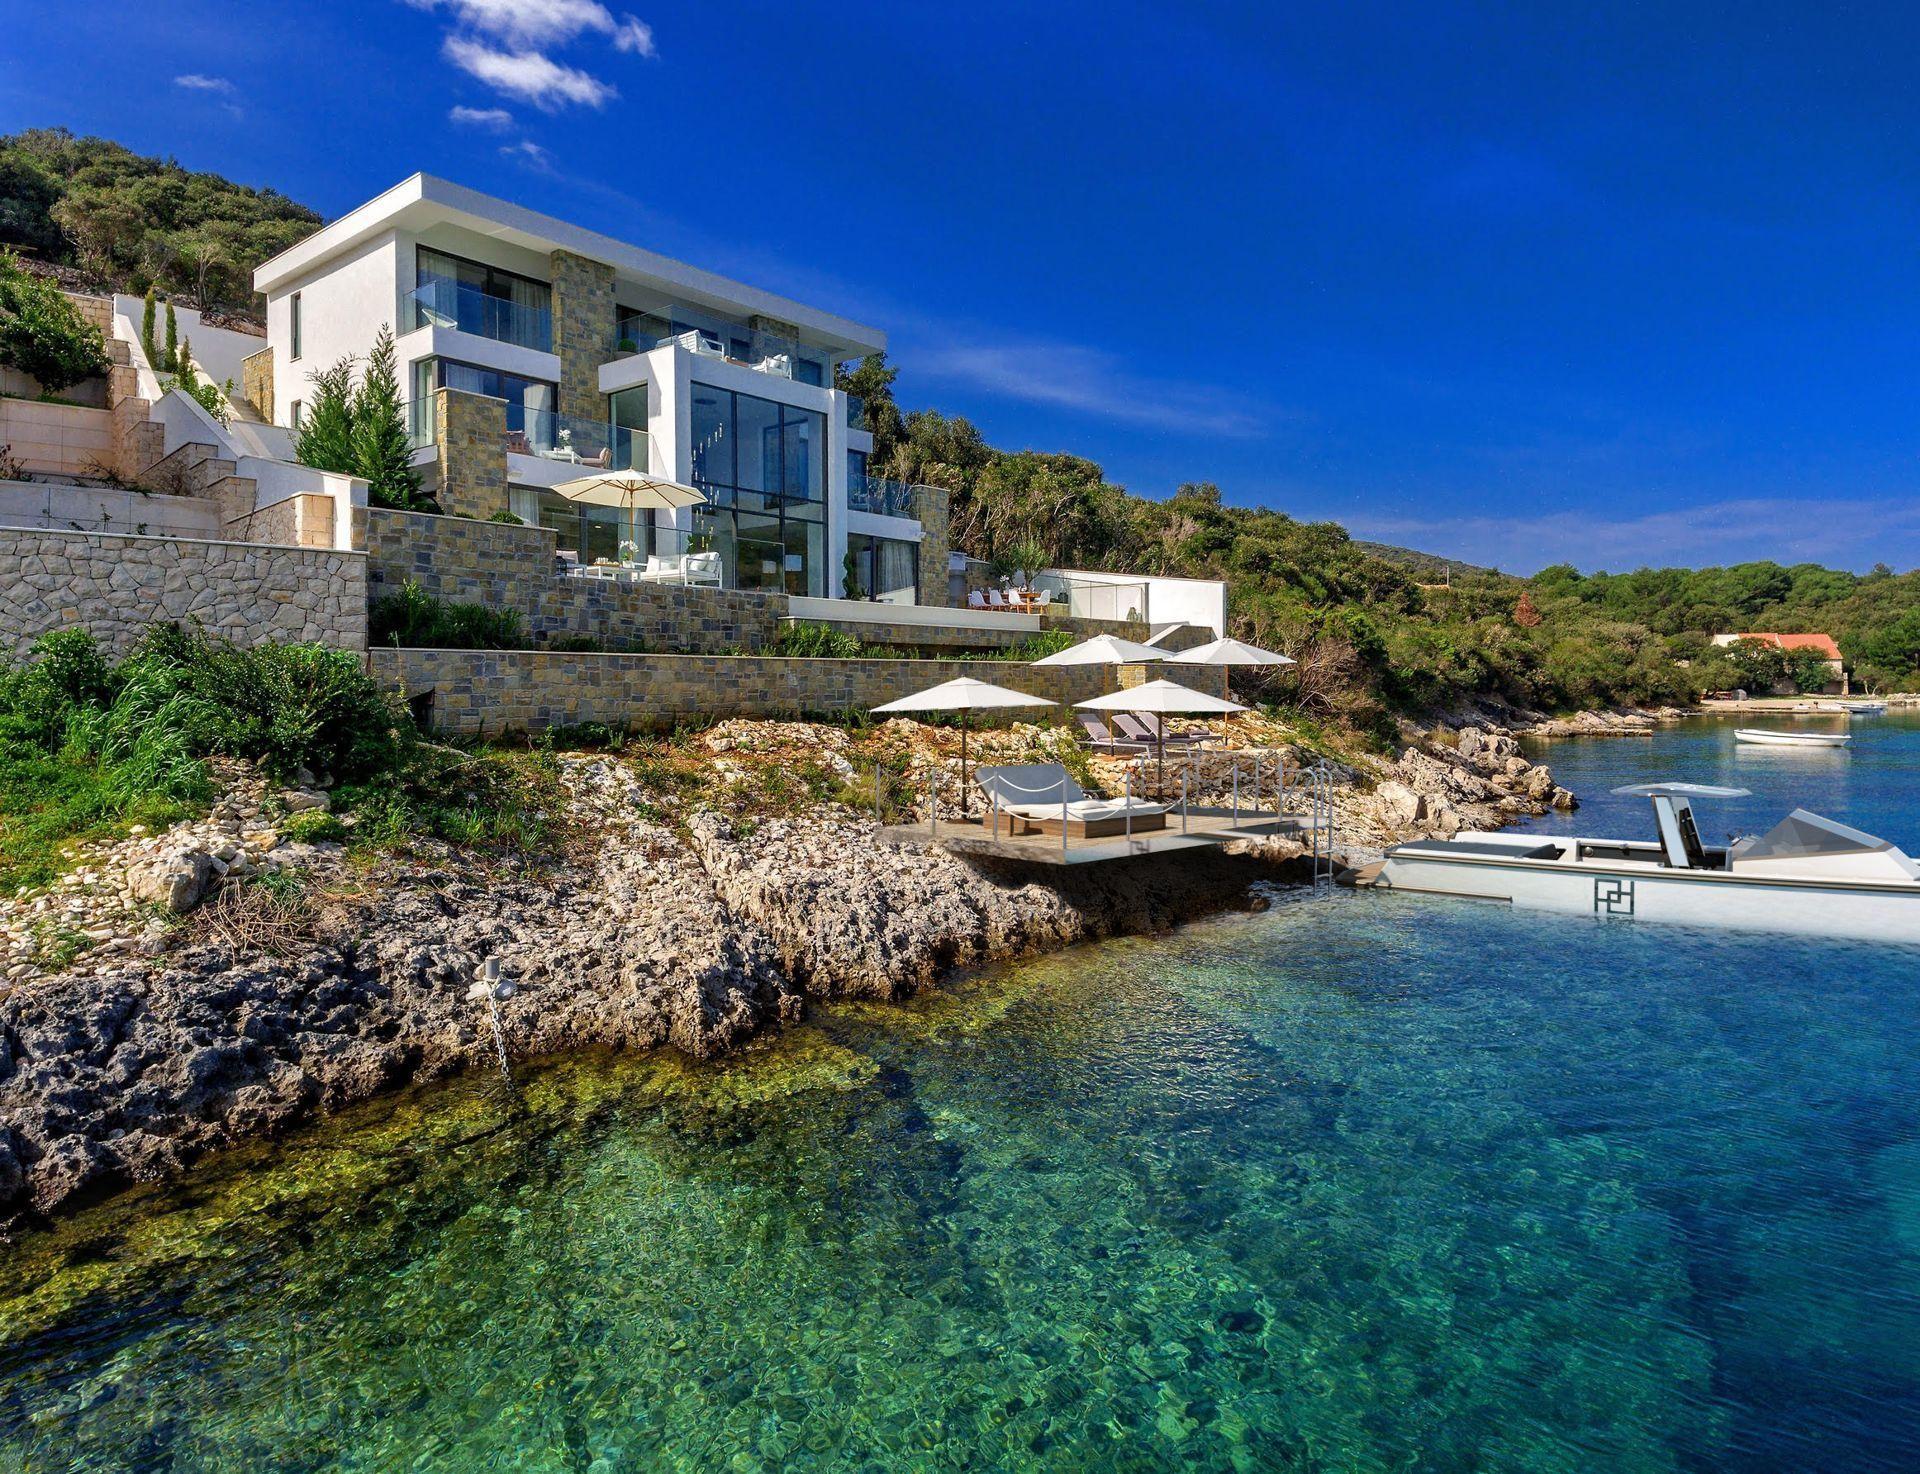 Property | Hoppify | Beautiful Homes, Croatia | House styles